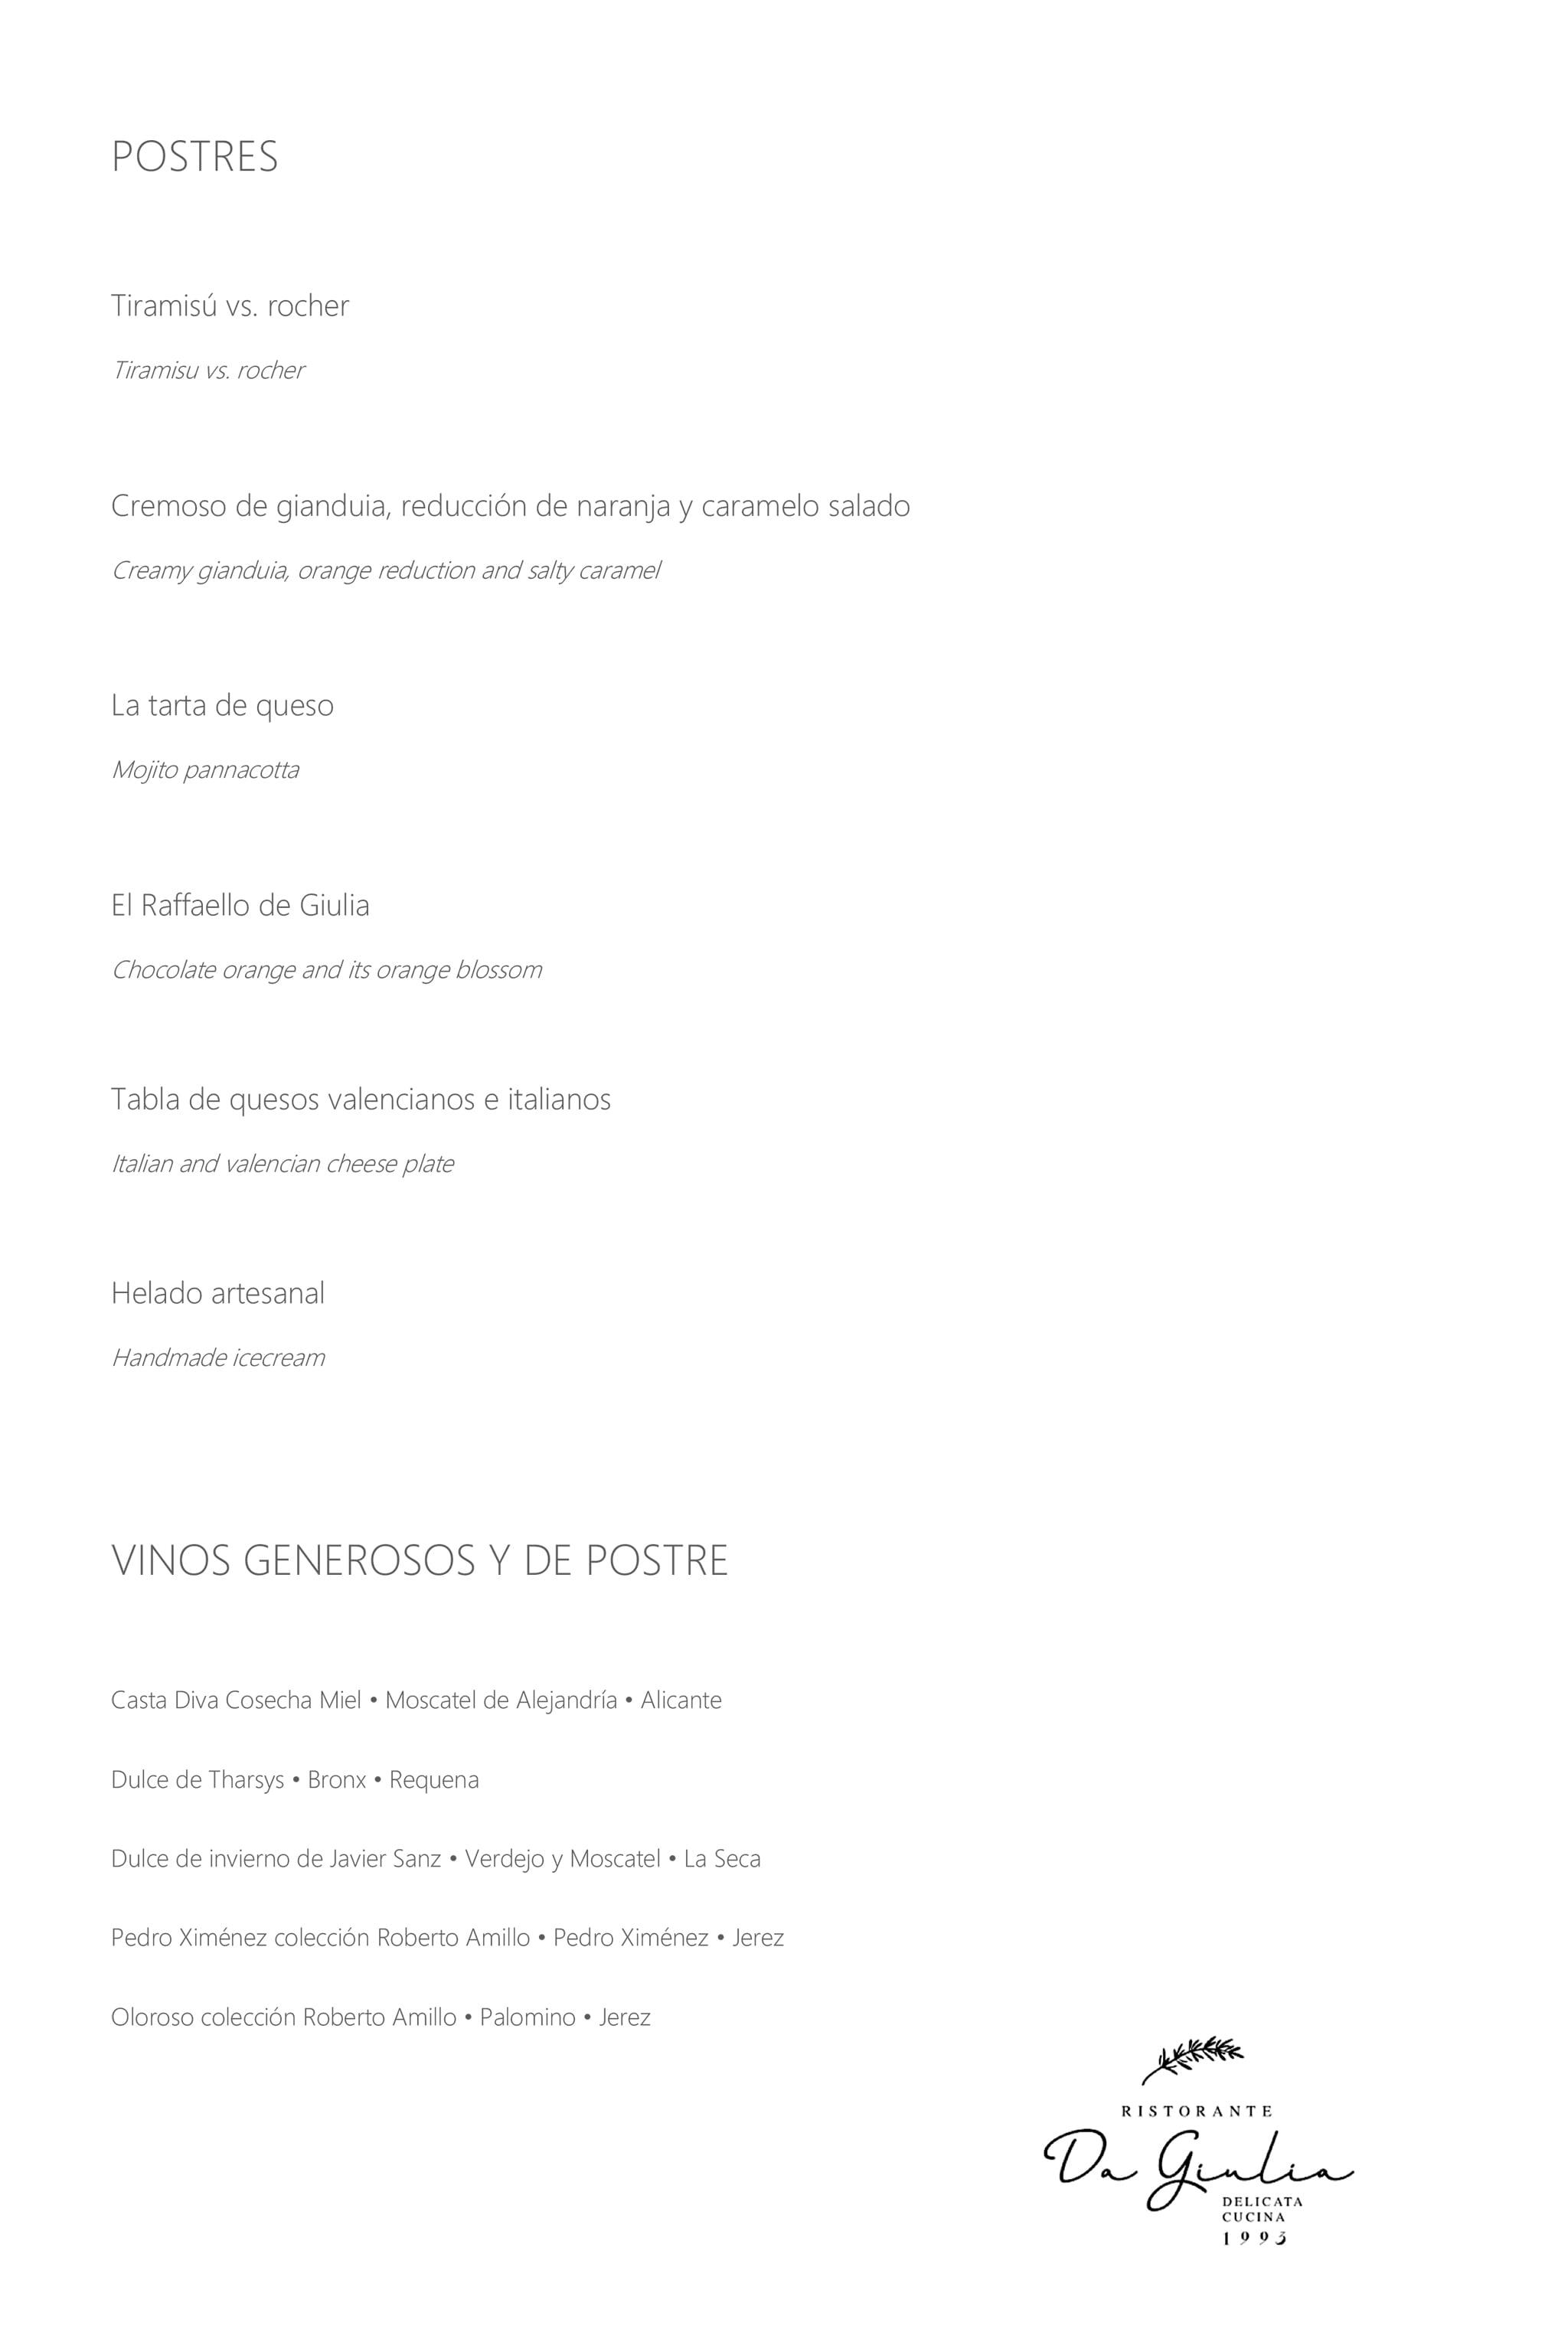 Nueva carta de Restaurante Da Giulia, página 4